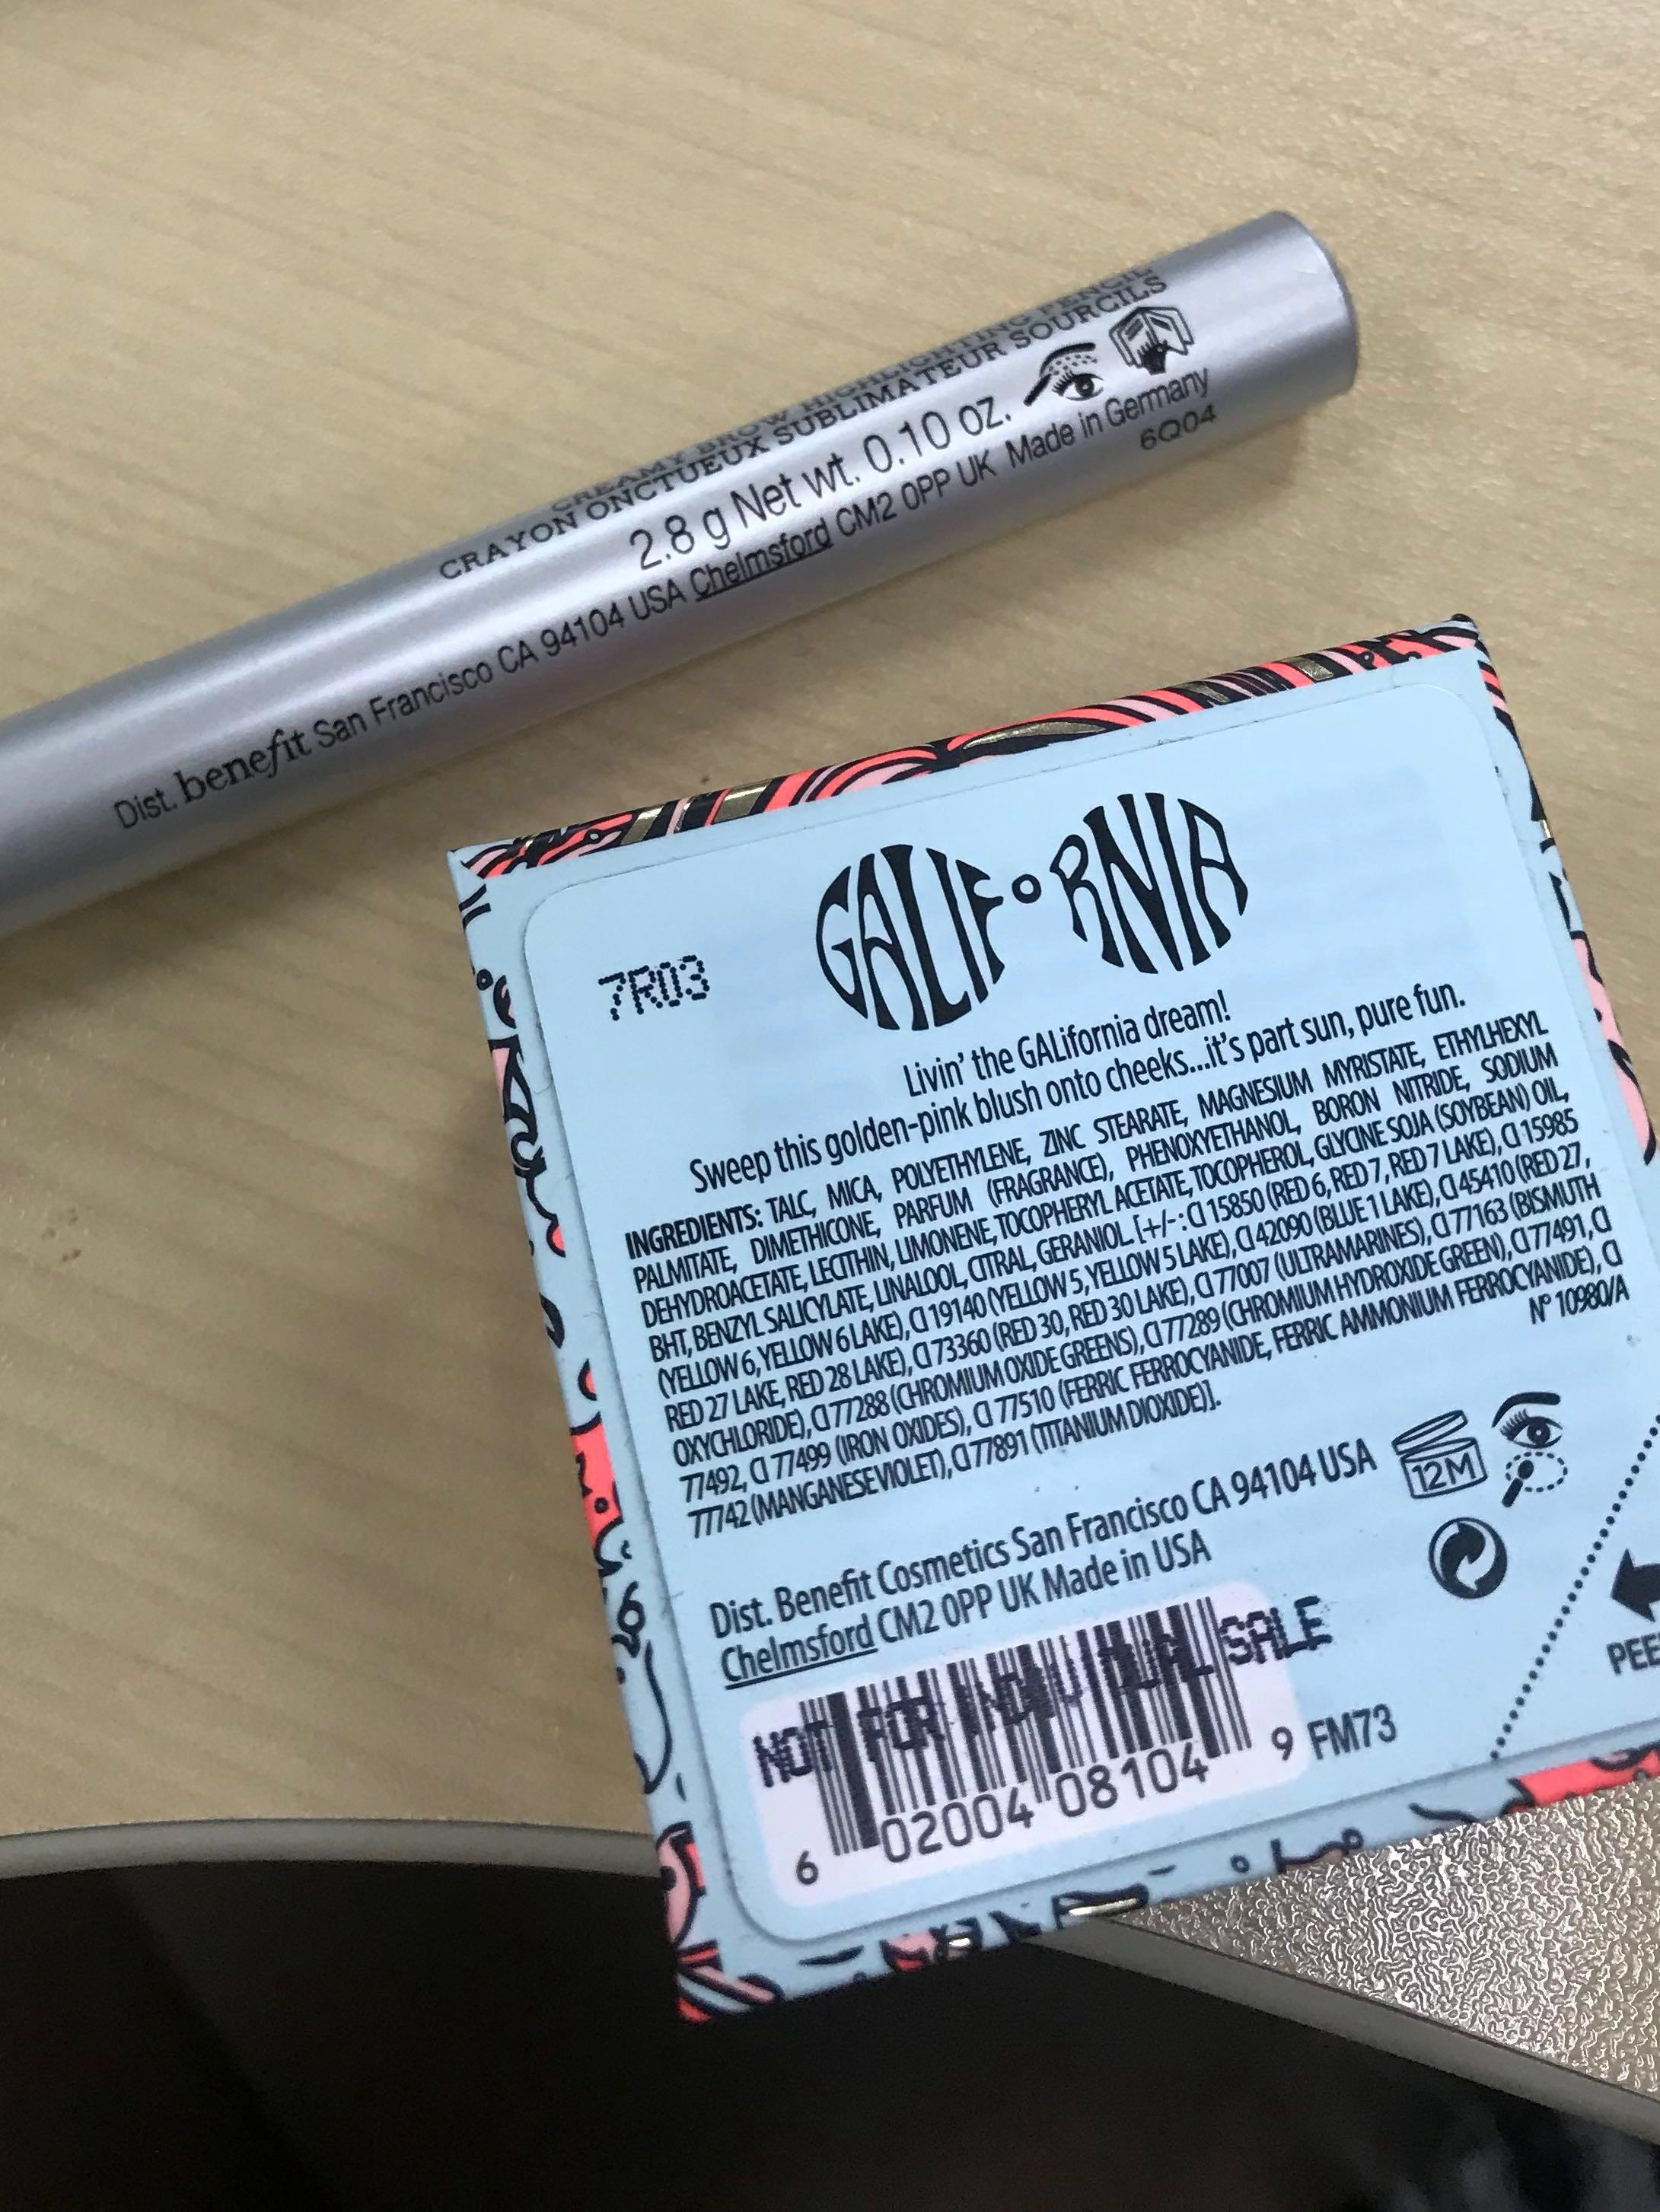 Benefit High Brow highlight pencil Galifornia blush bundle